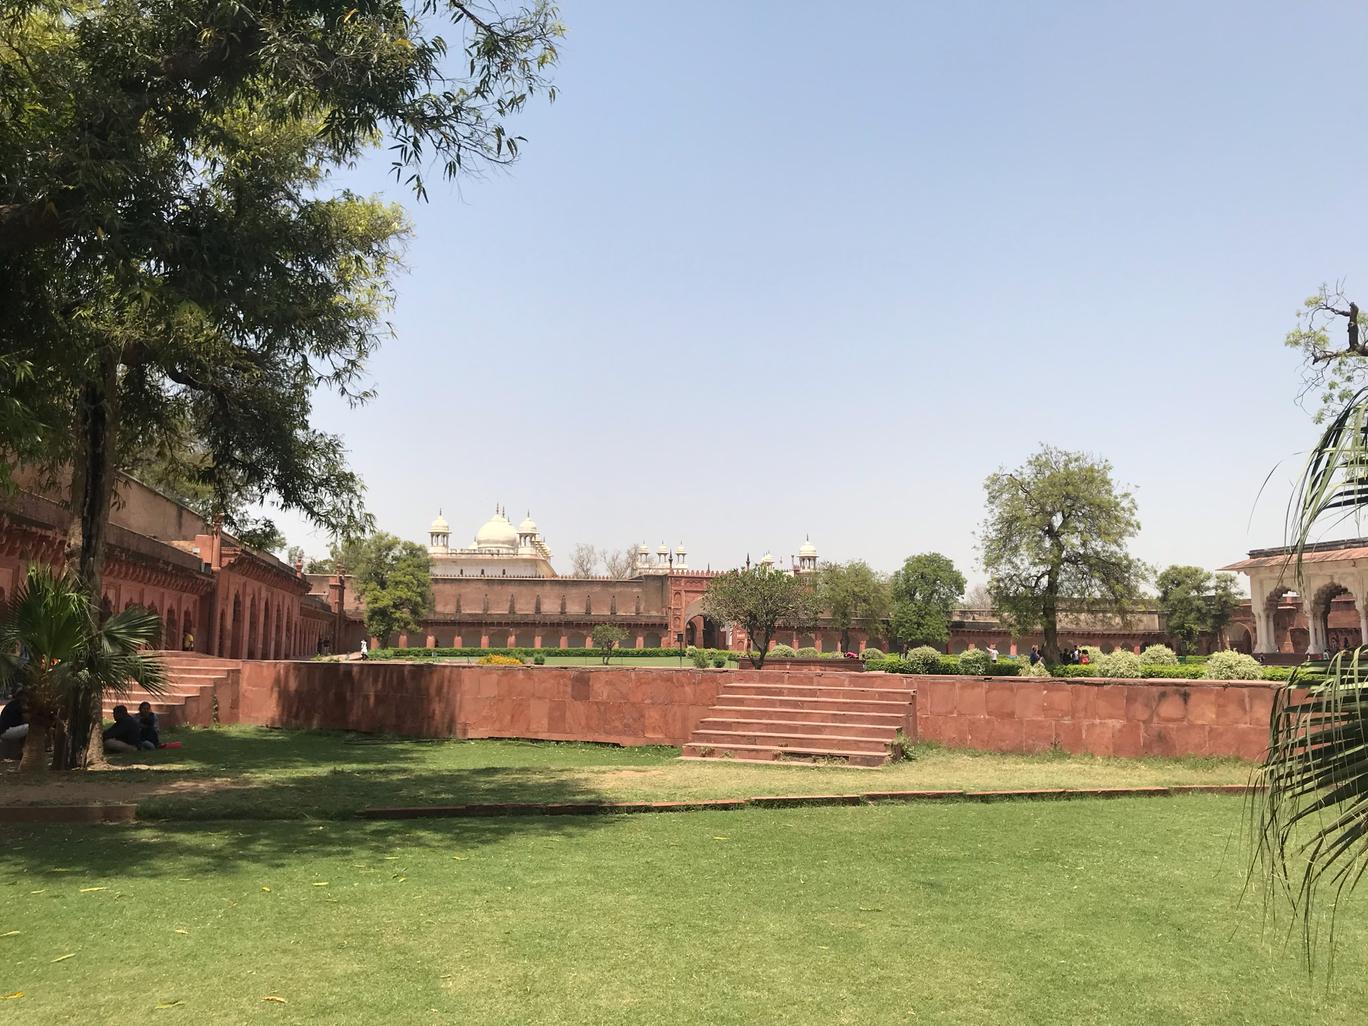 Photo of Agra By Nilz